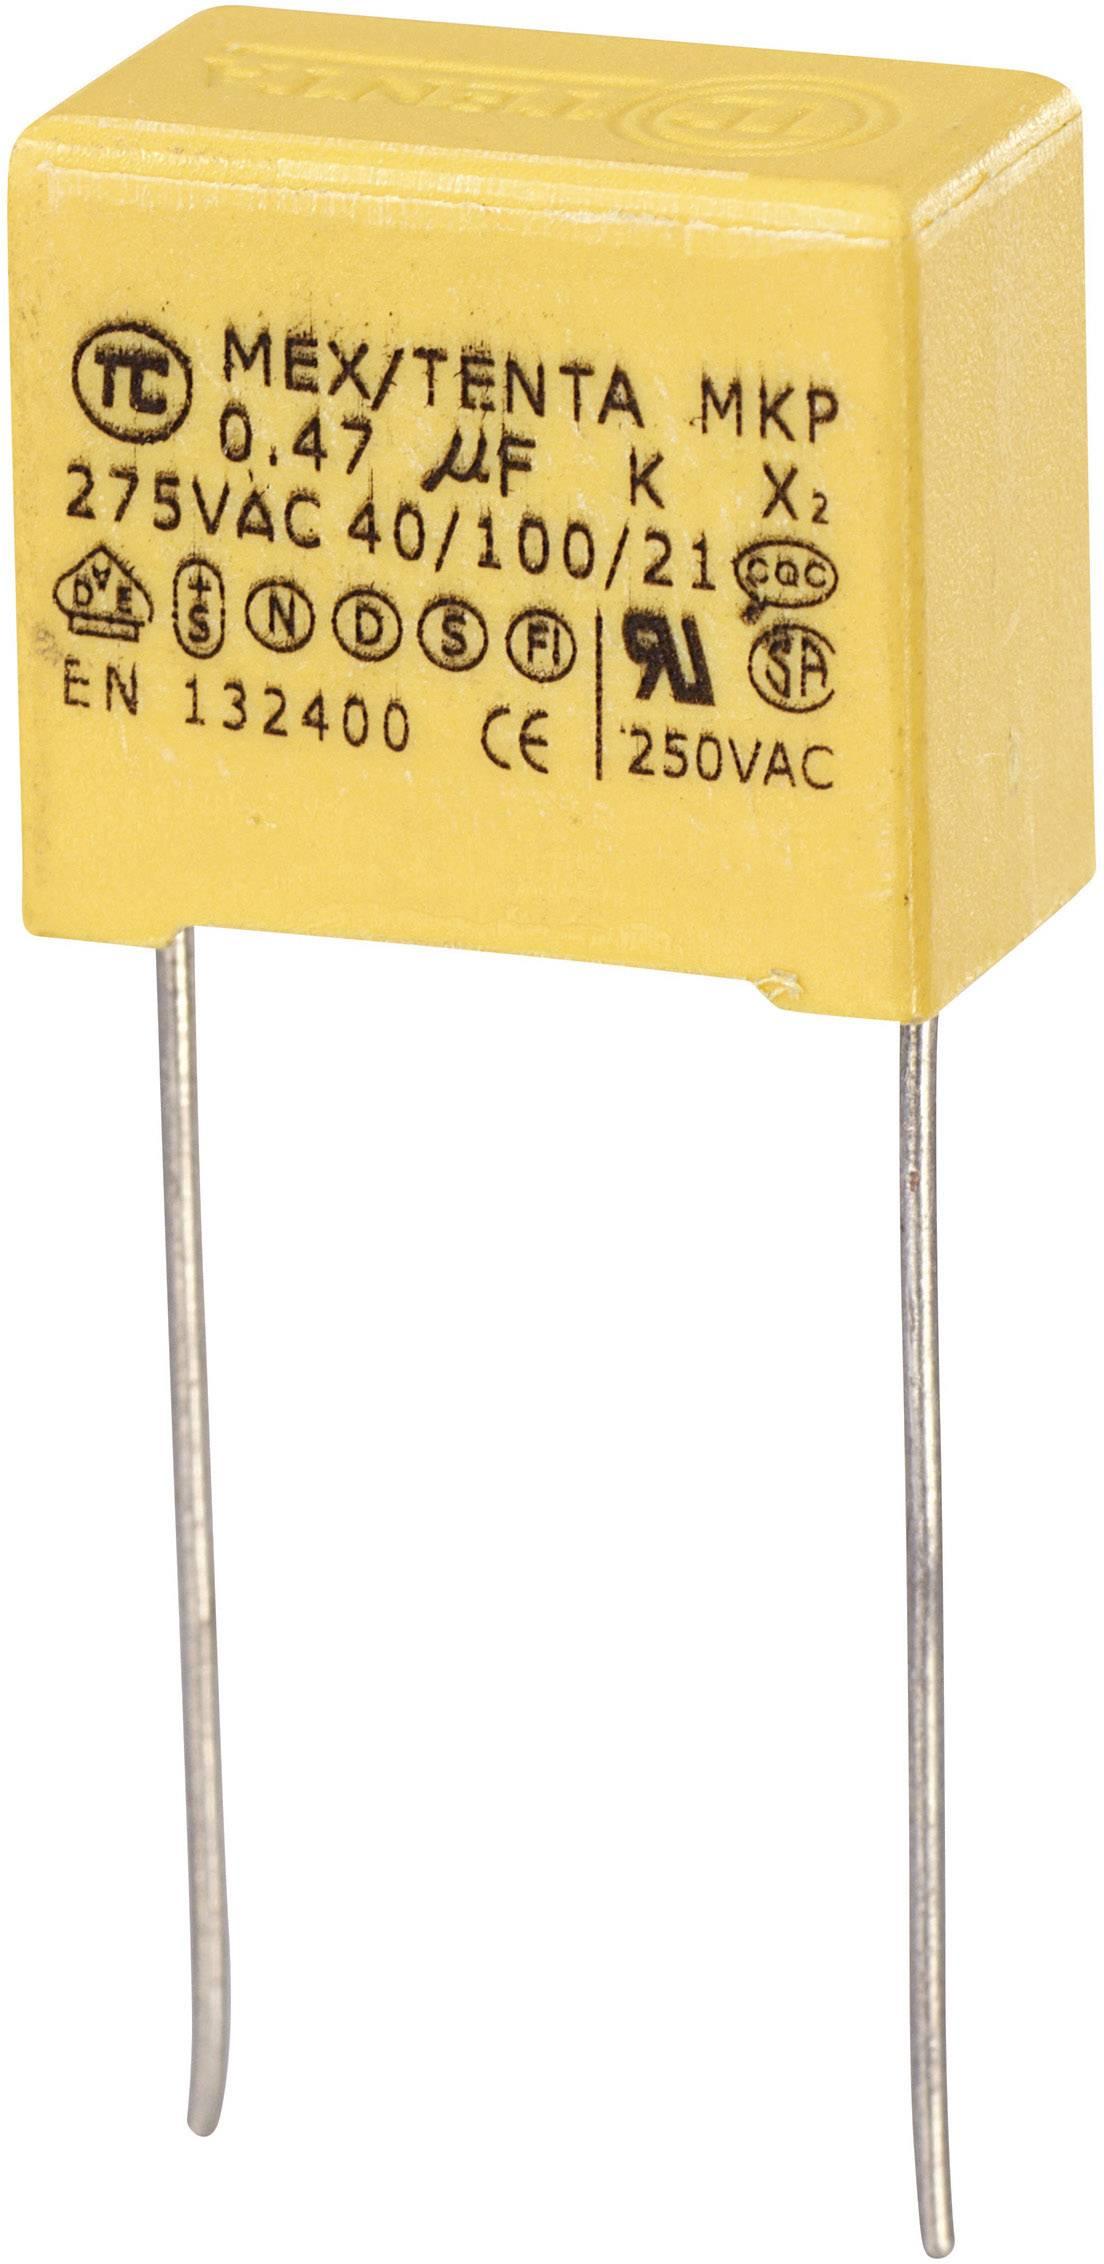 Foliový kondenzátor MKP, 0,68 µF, X2 275 V/AC, 10 %, 18 x 10 x 16 mm